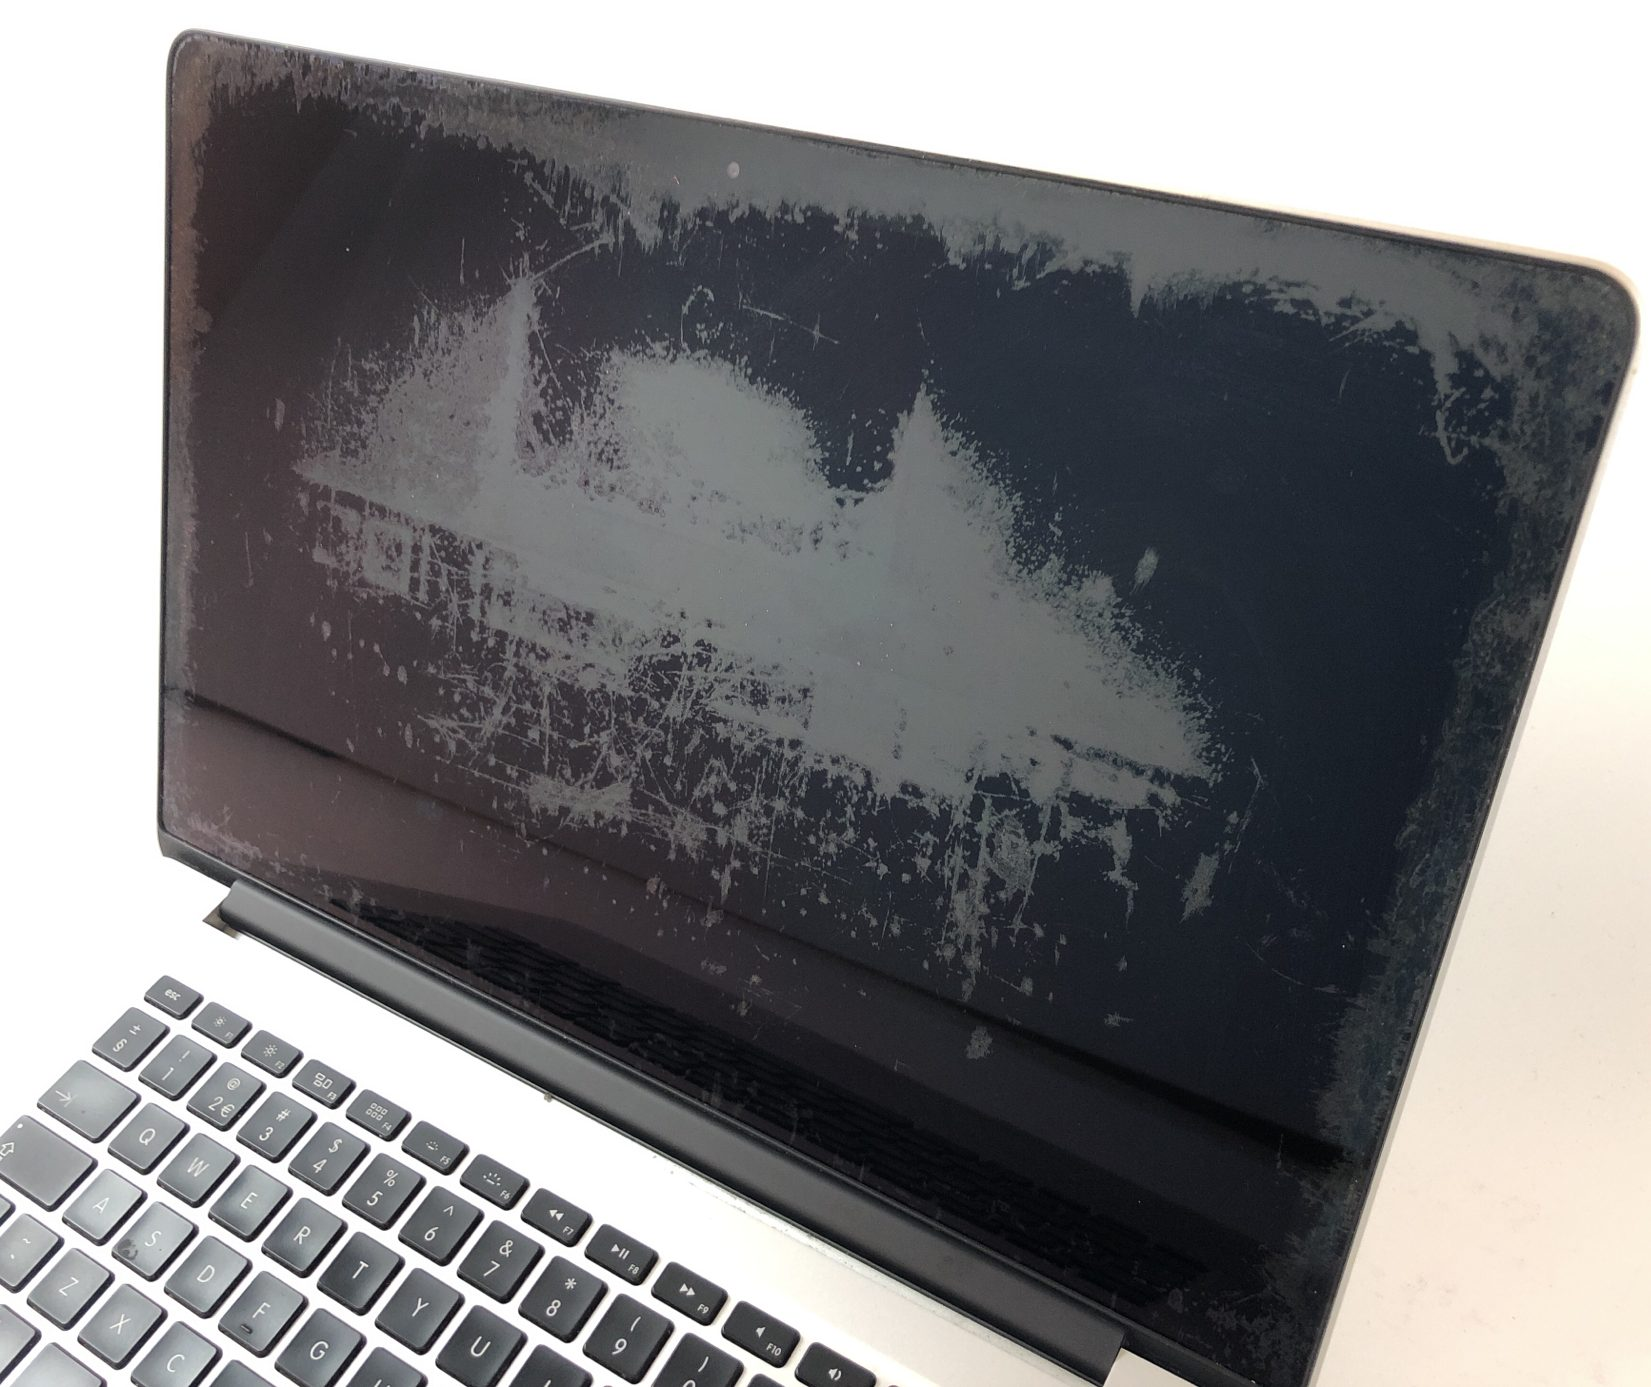 "MacBook Pro Retina 15"" Late 2013 (Intel Quad-Core i7 2.0 GHz 16 GB RAM 256 GB SSD), Intel Quad-Core i7 2.0 GHz, 16 GB RAM, 256 GB SSD, Afbeelding 3"